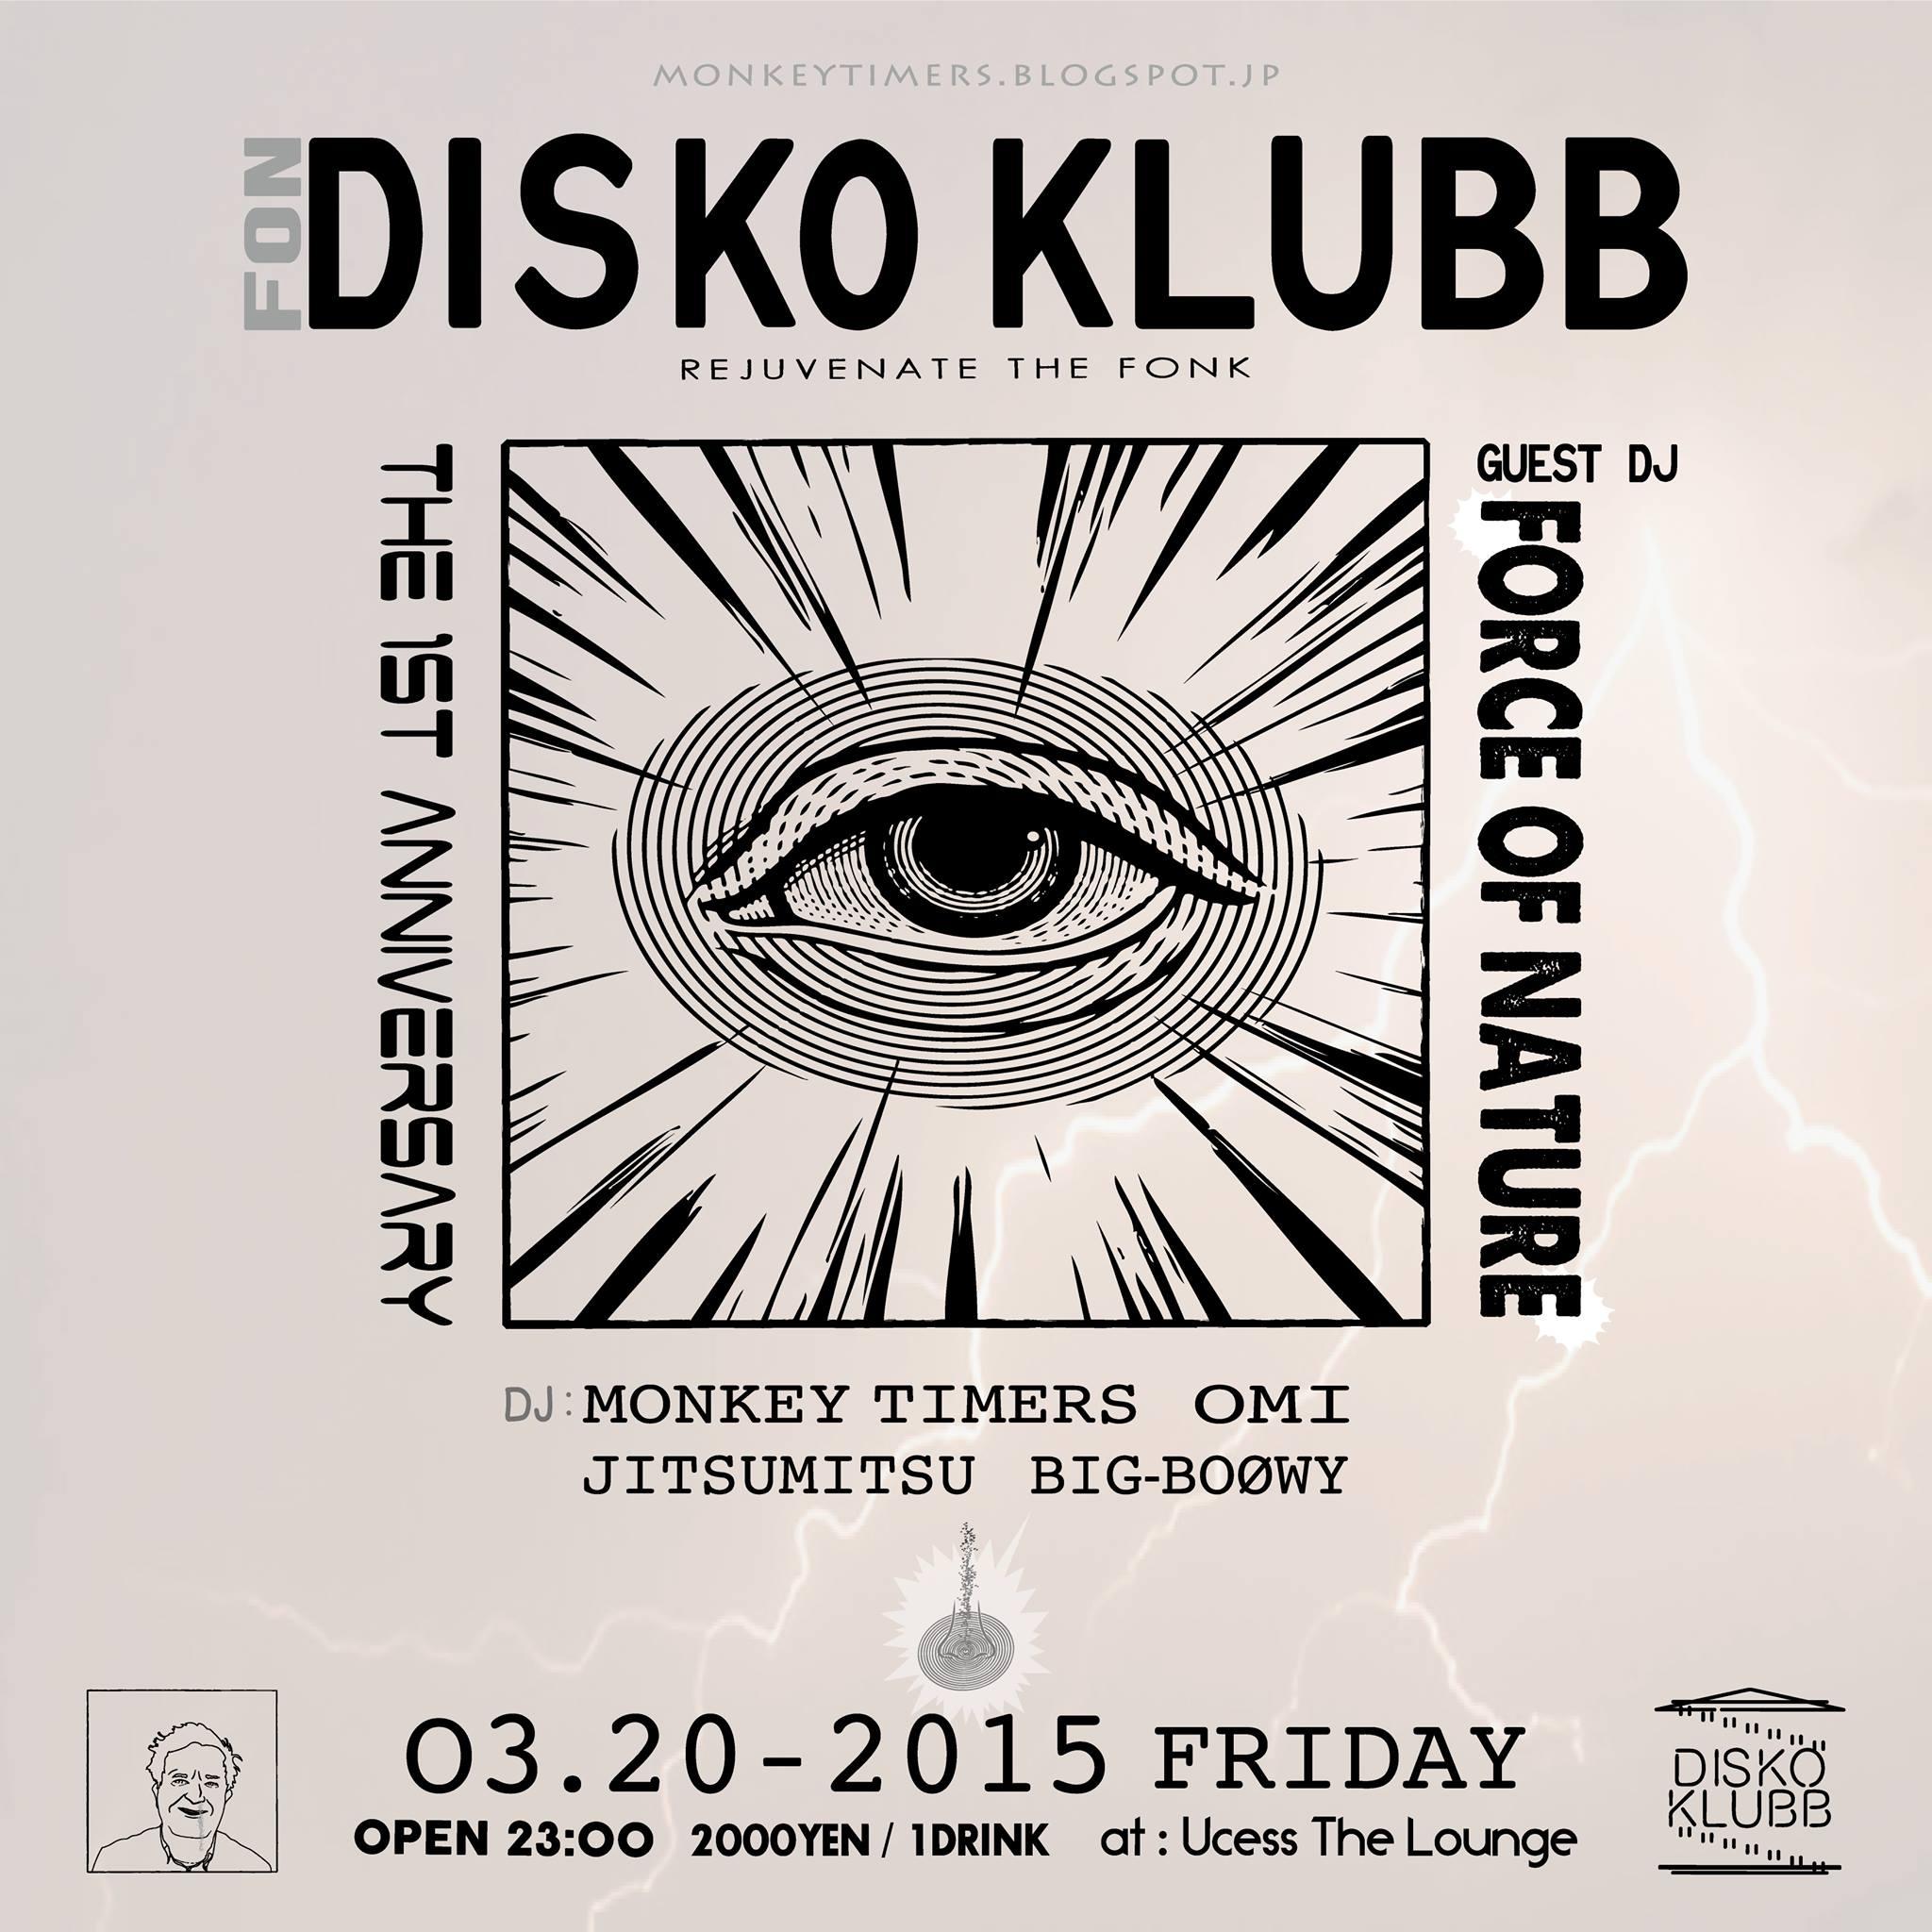 DISKO KLUBB ft FORCE OF NATURE